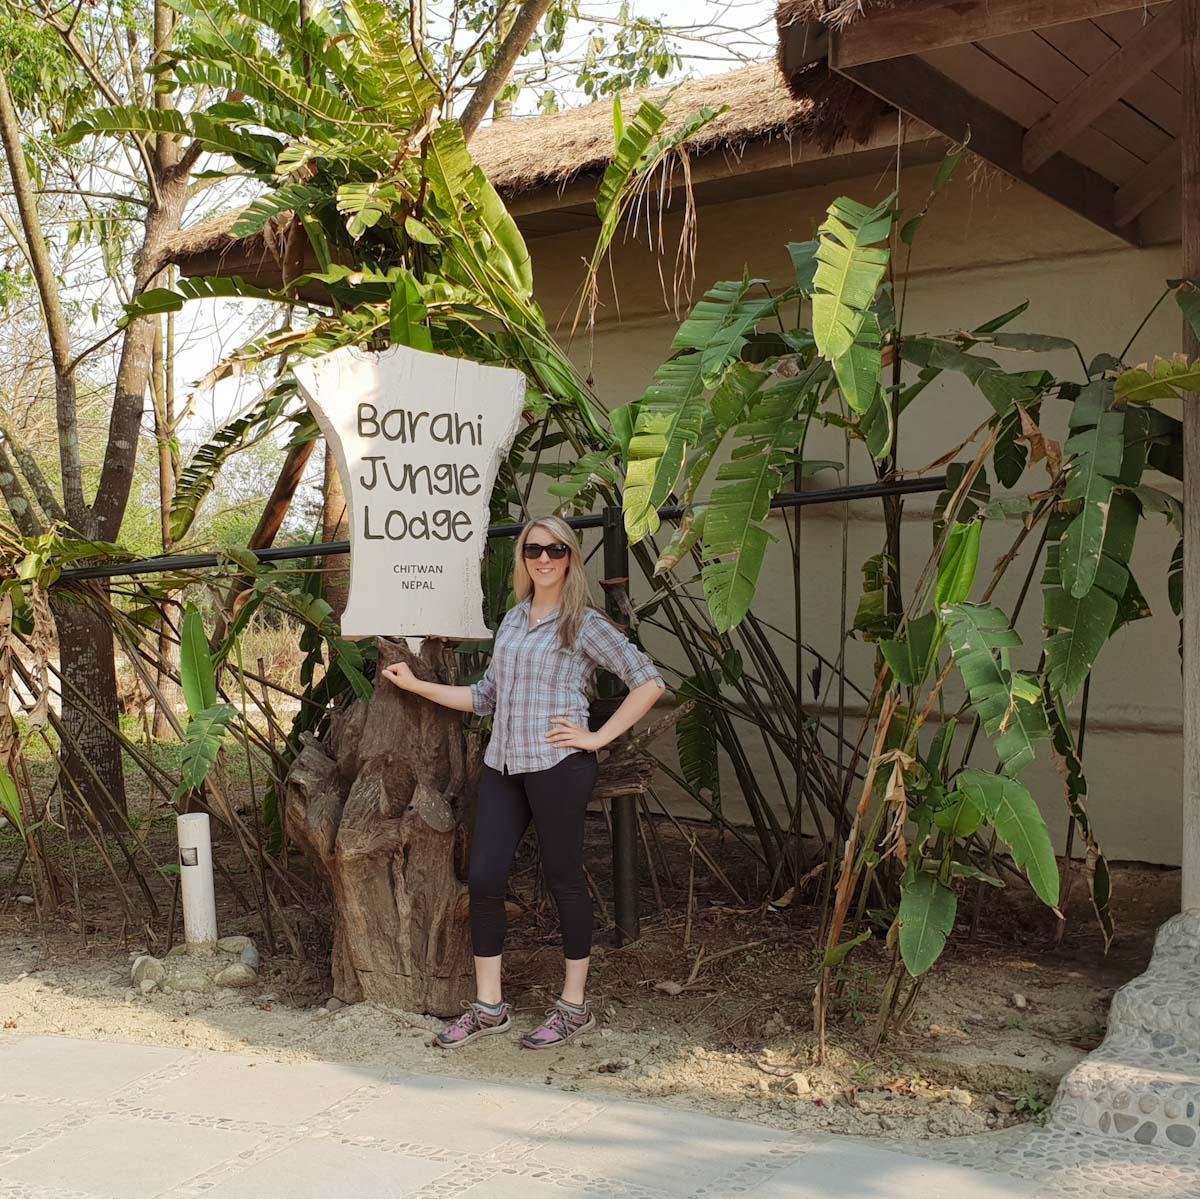 Jean at Barahi Jungle lodge